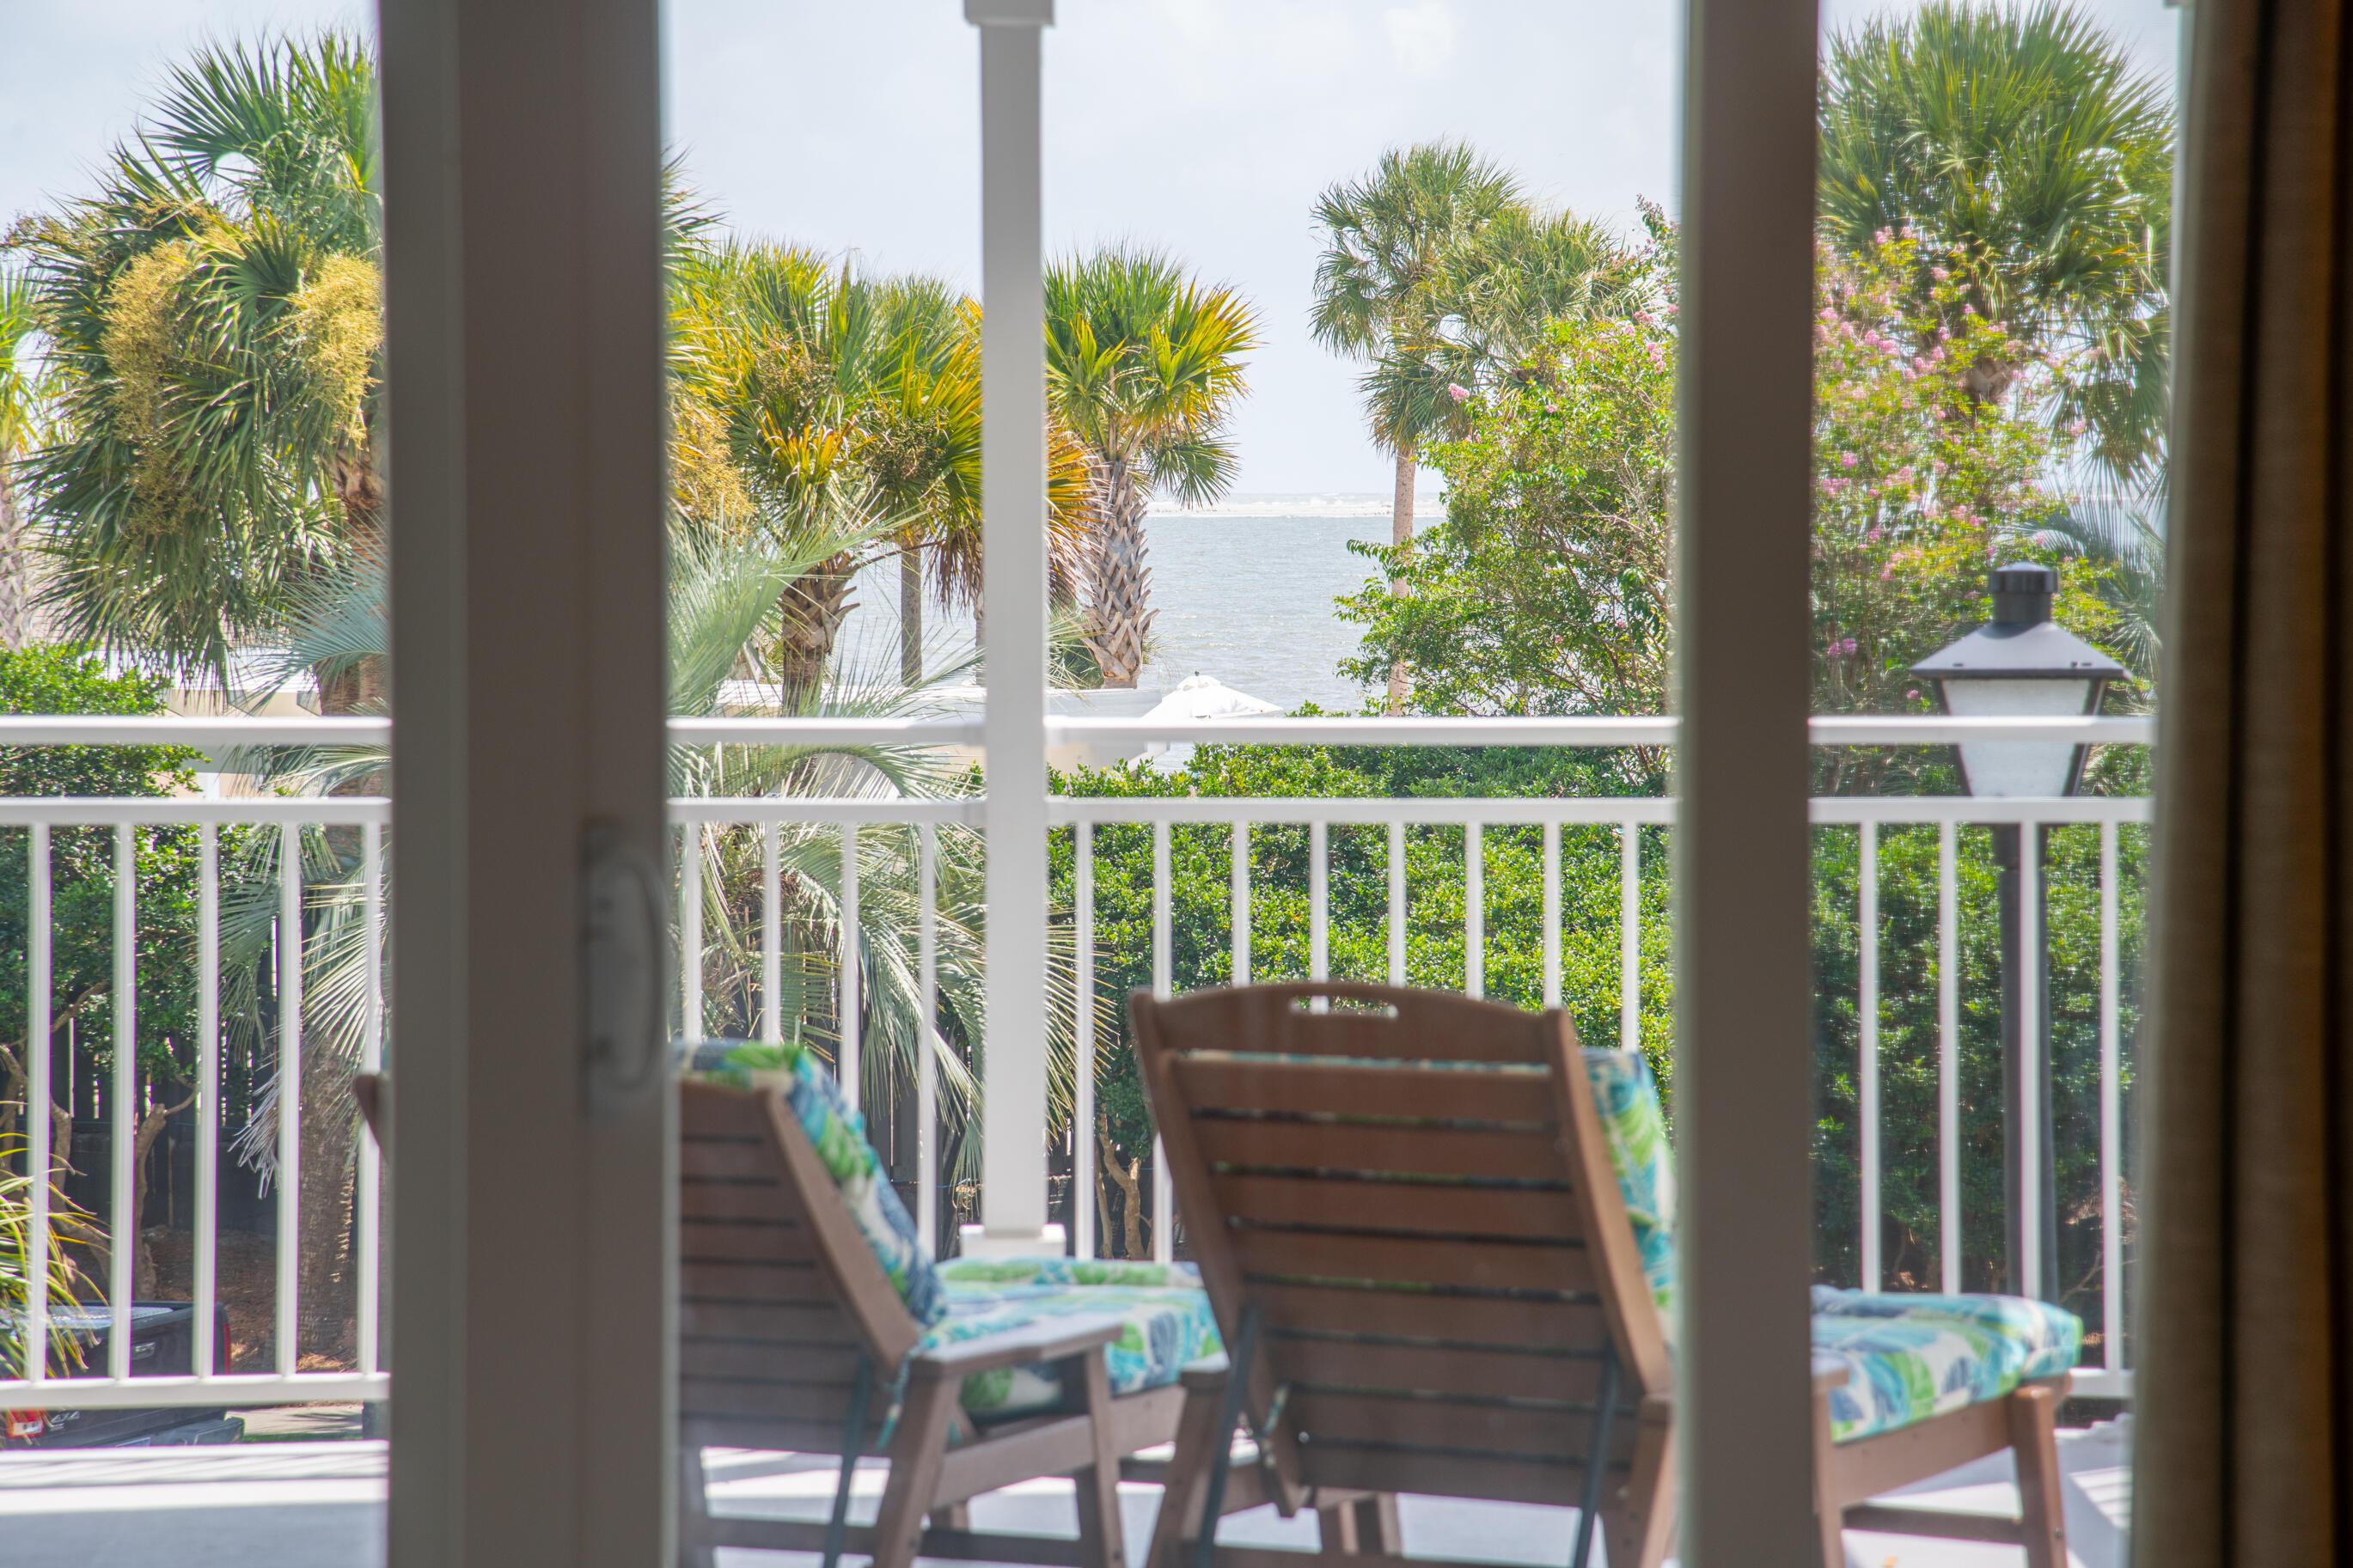 Atrium Villas Homes For Sale - 2935 Atrium Villa, Seabrook Island, SC - 7